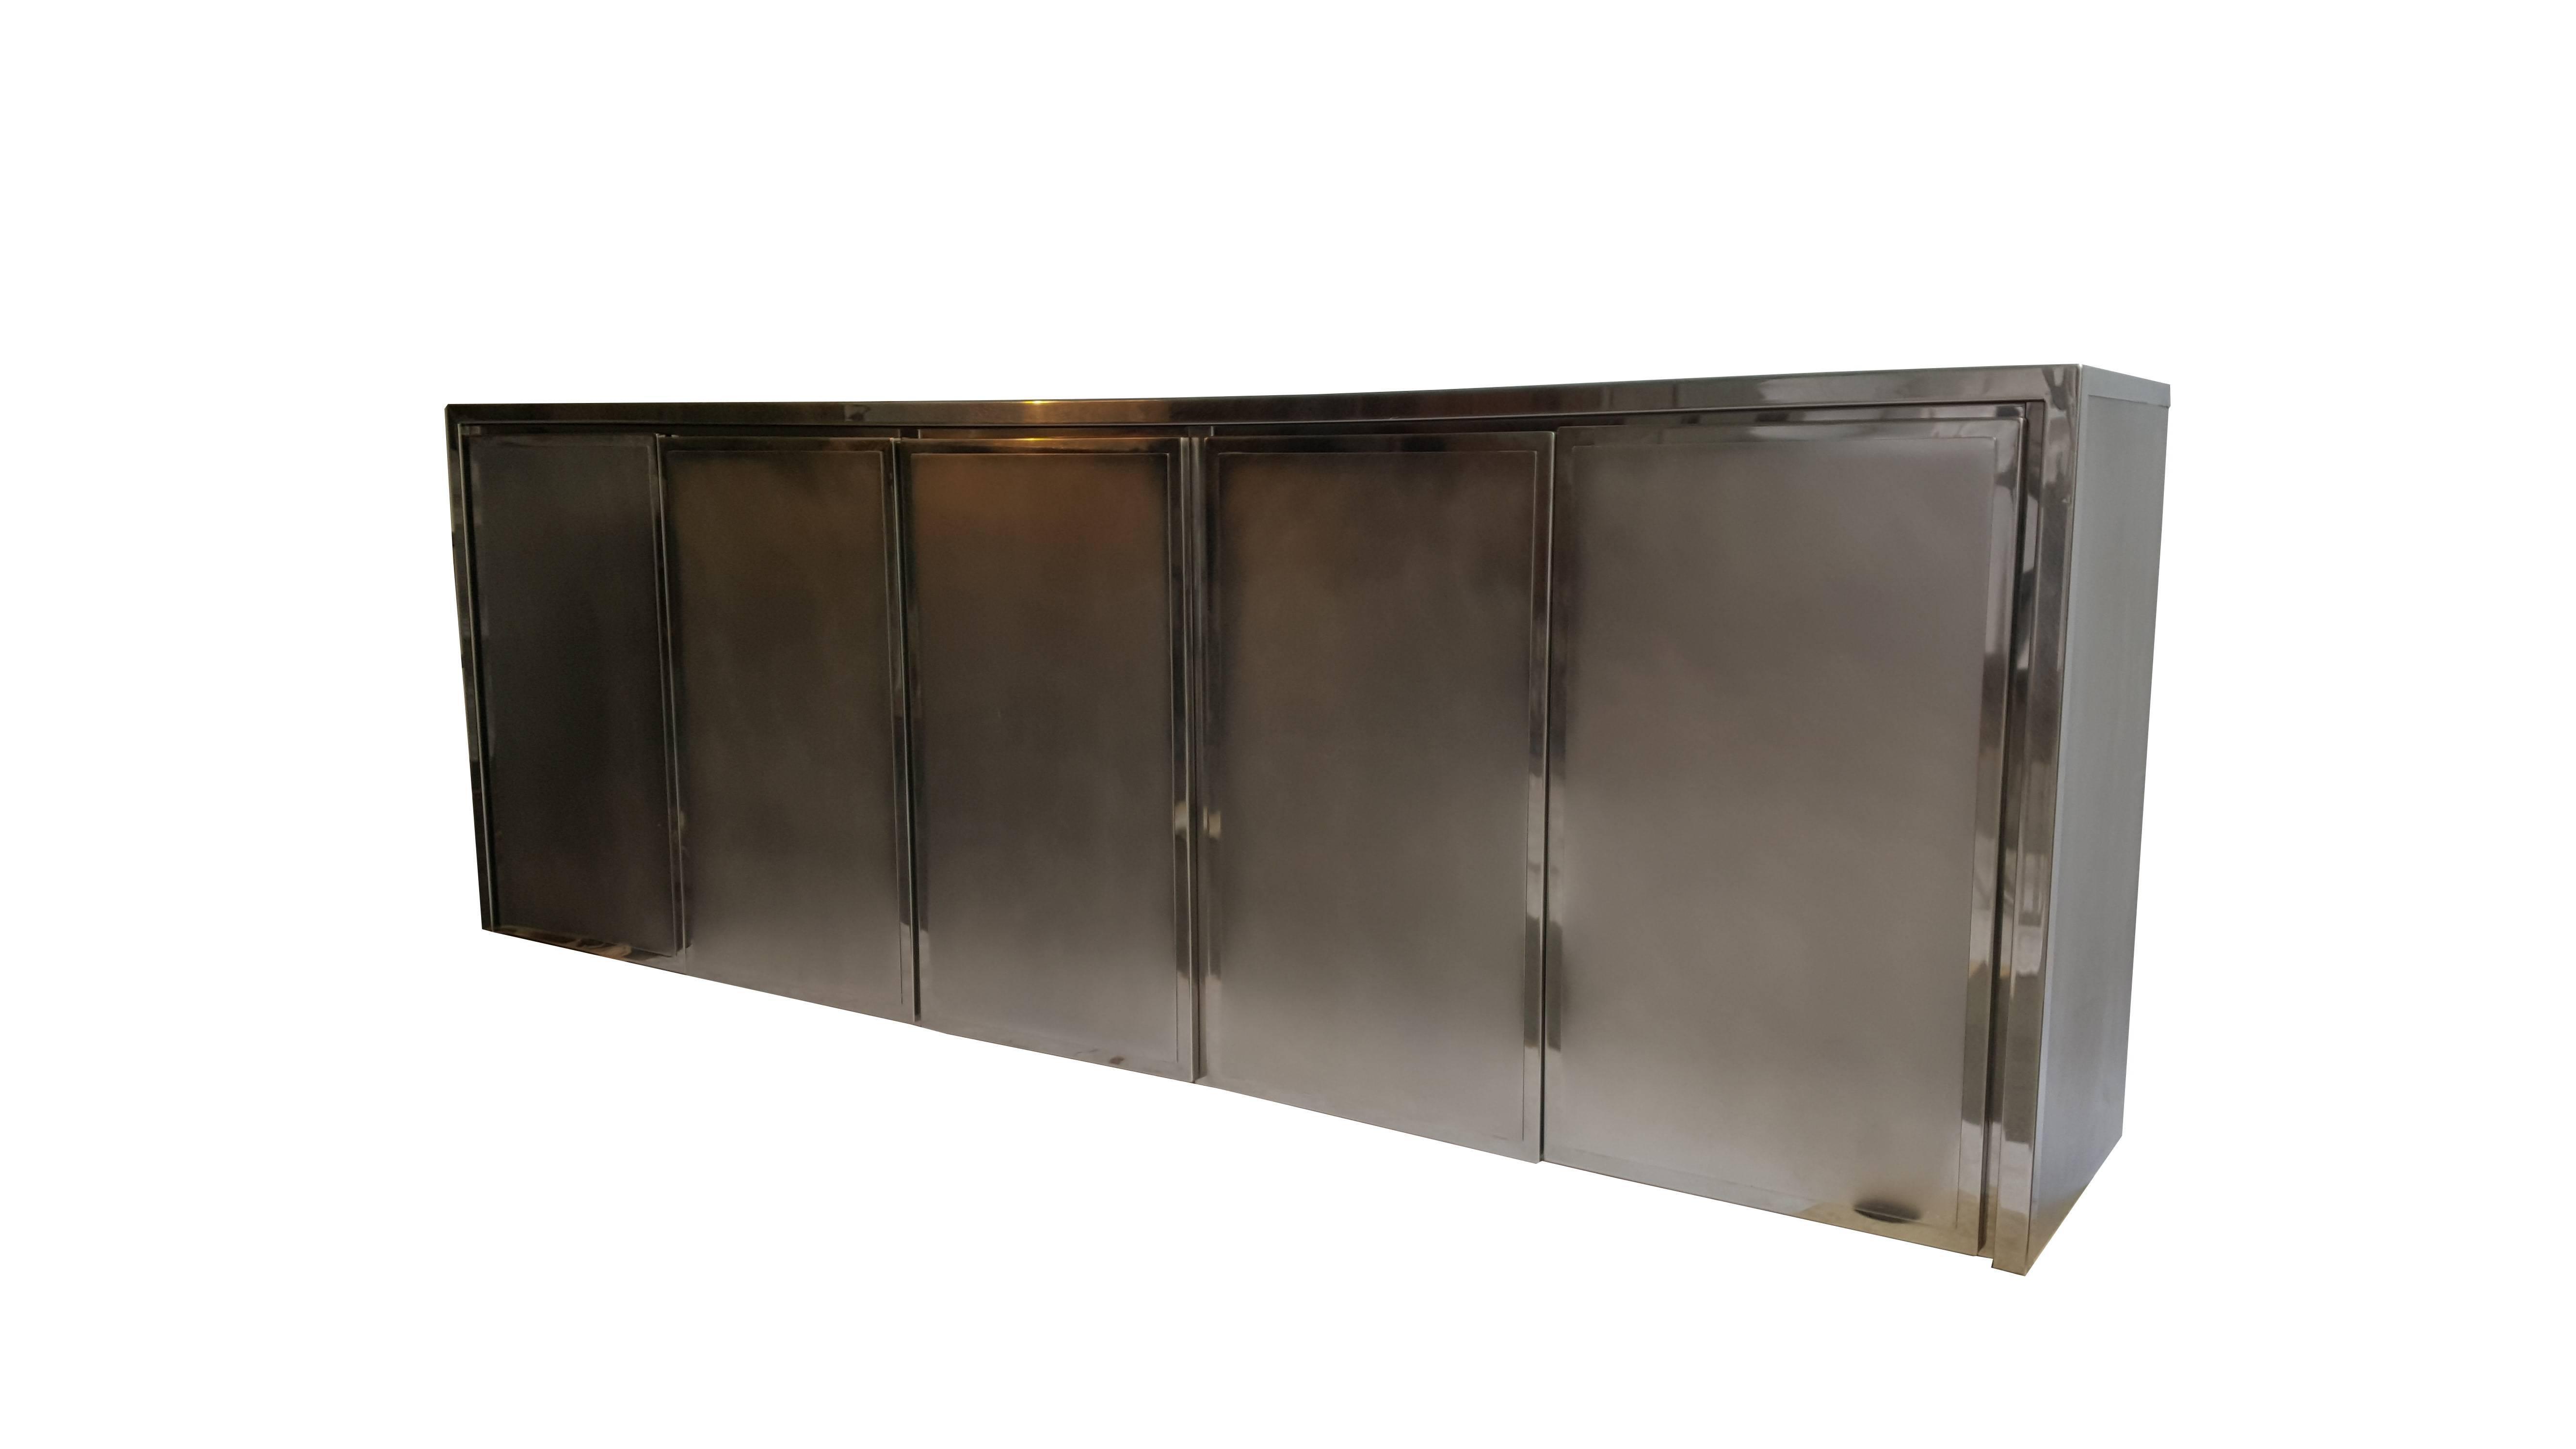 Credenza La Maison : Brushed chrome five door sideboard credenza by belgo for sale